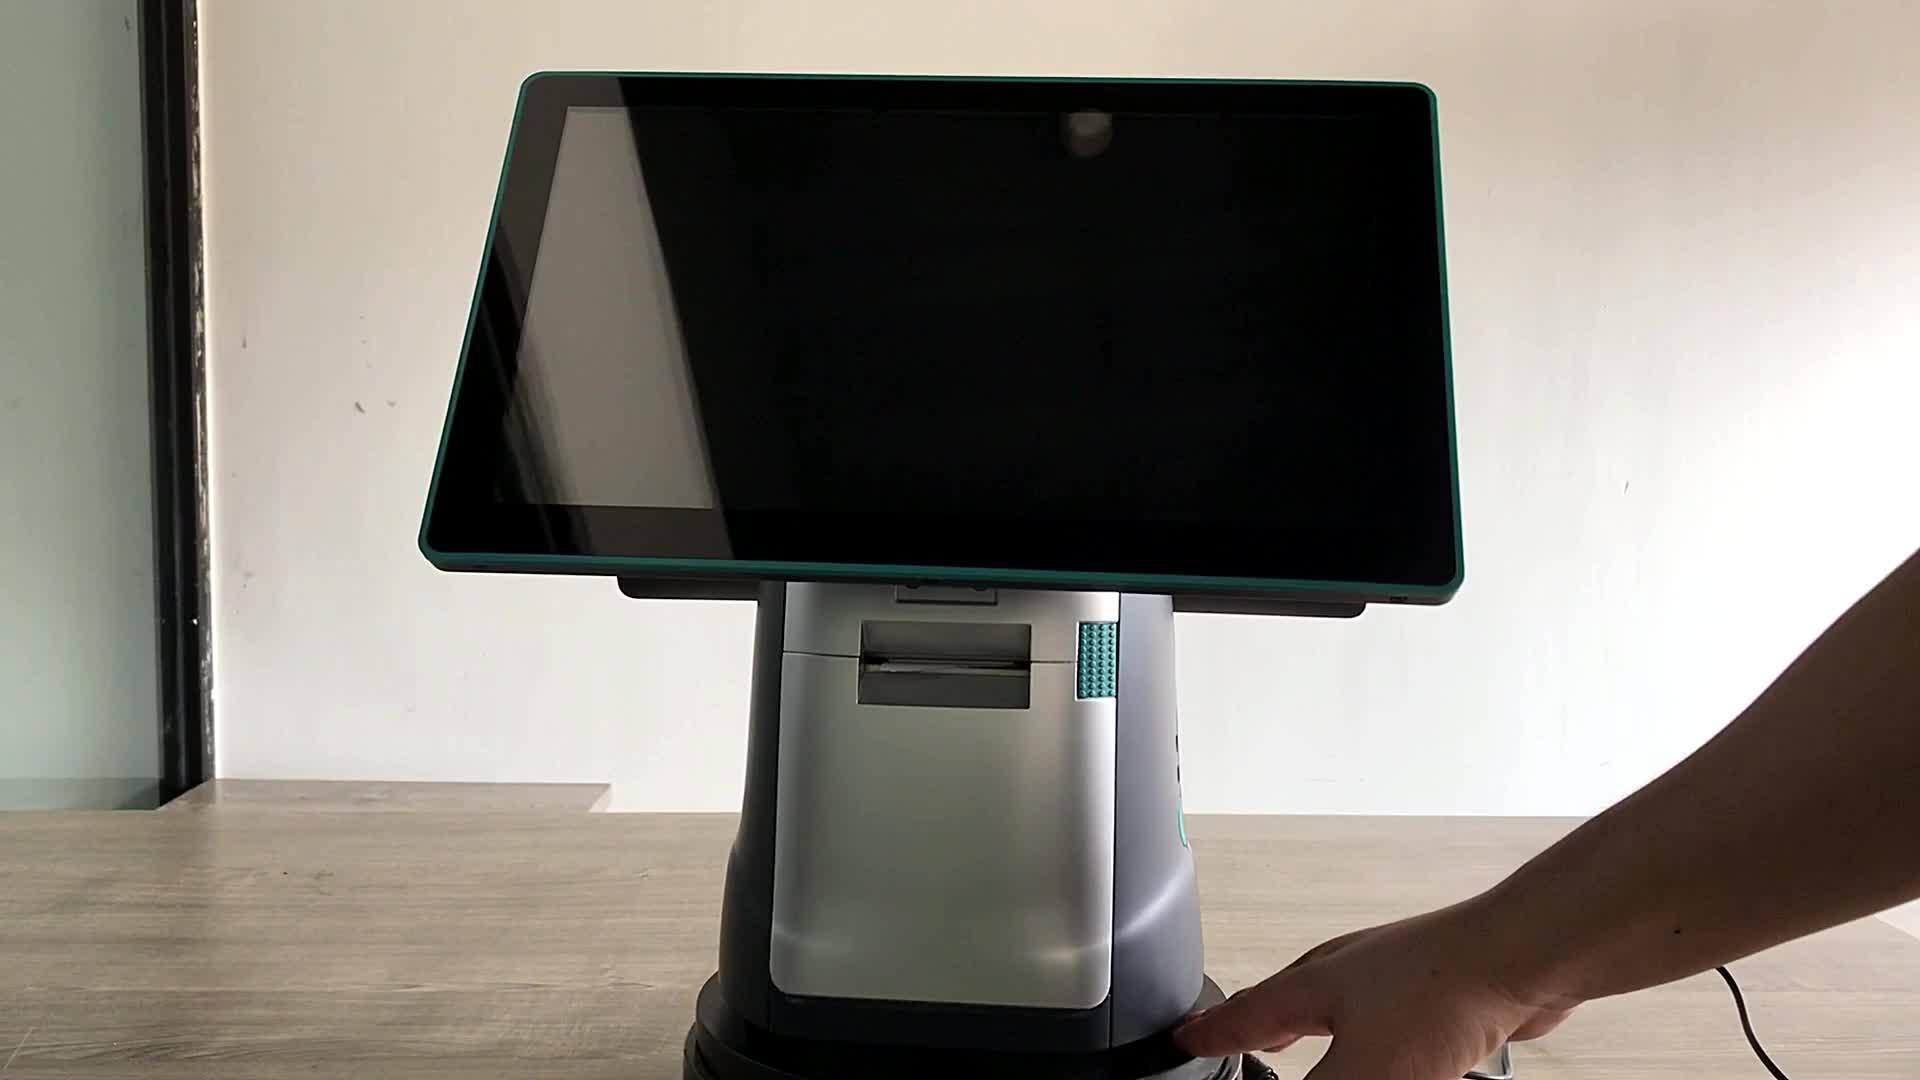 Android quad-core de Punto de Venta de doble pantalla de venta electrónica (epos) Sistema con recibo impresora nfc escáner de código de barras